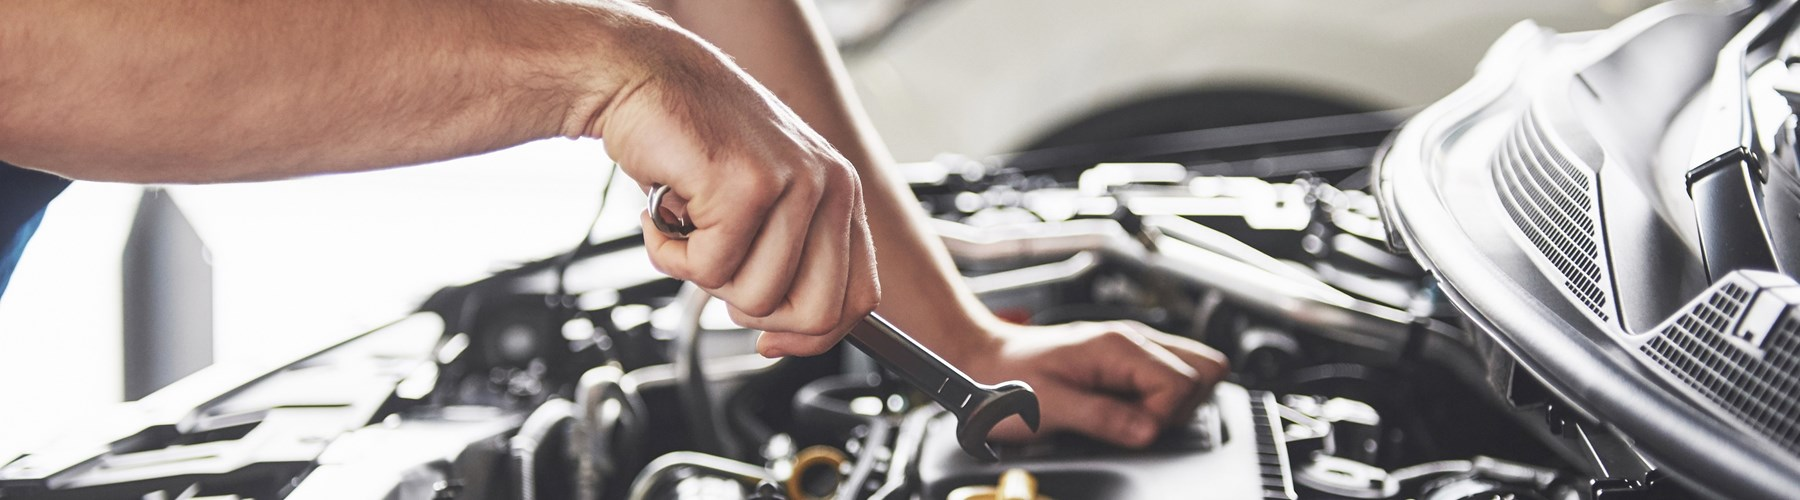 Man checking his car engine